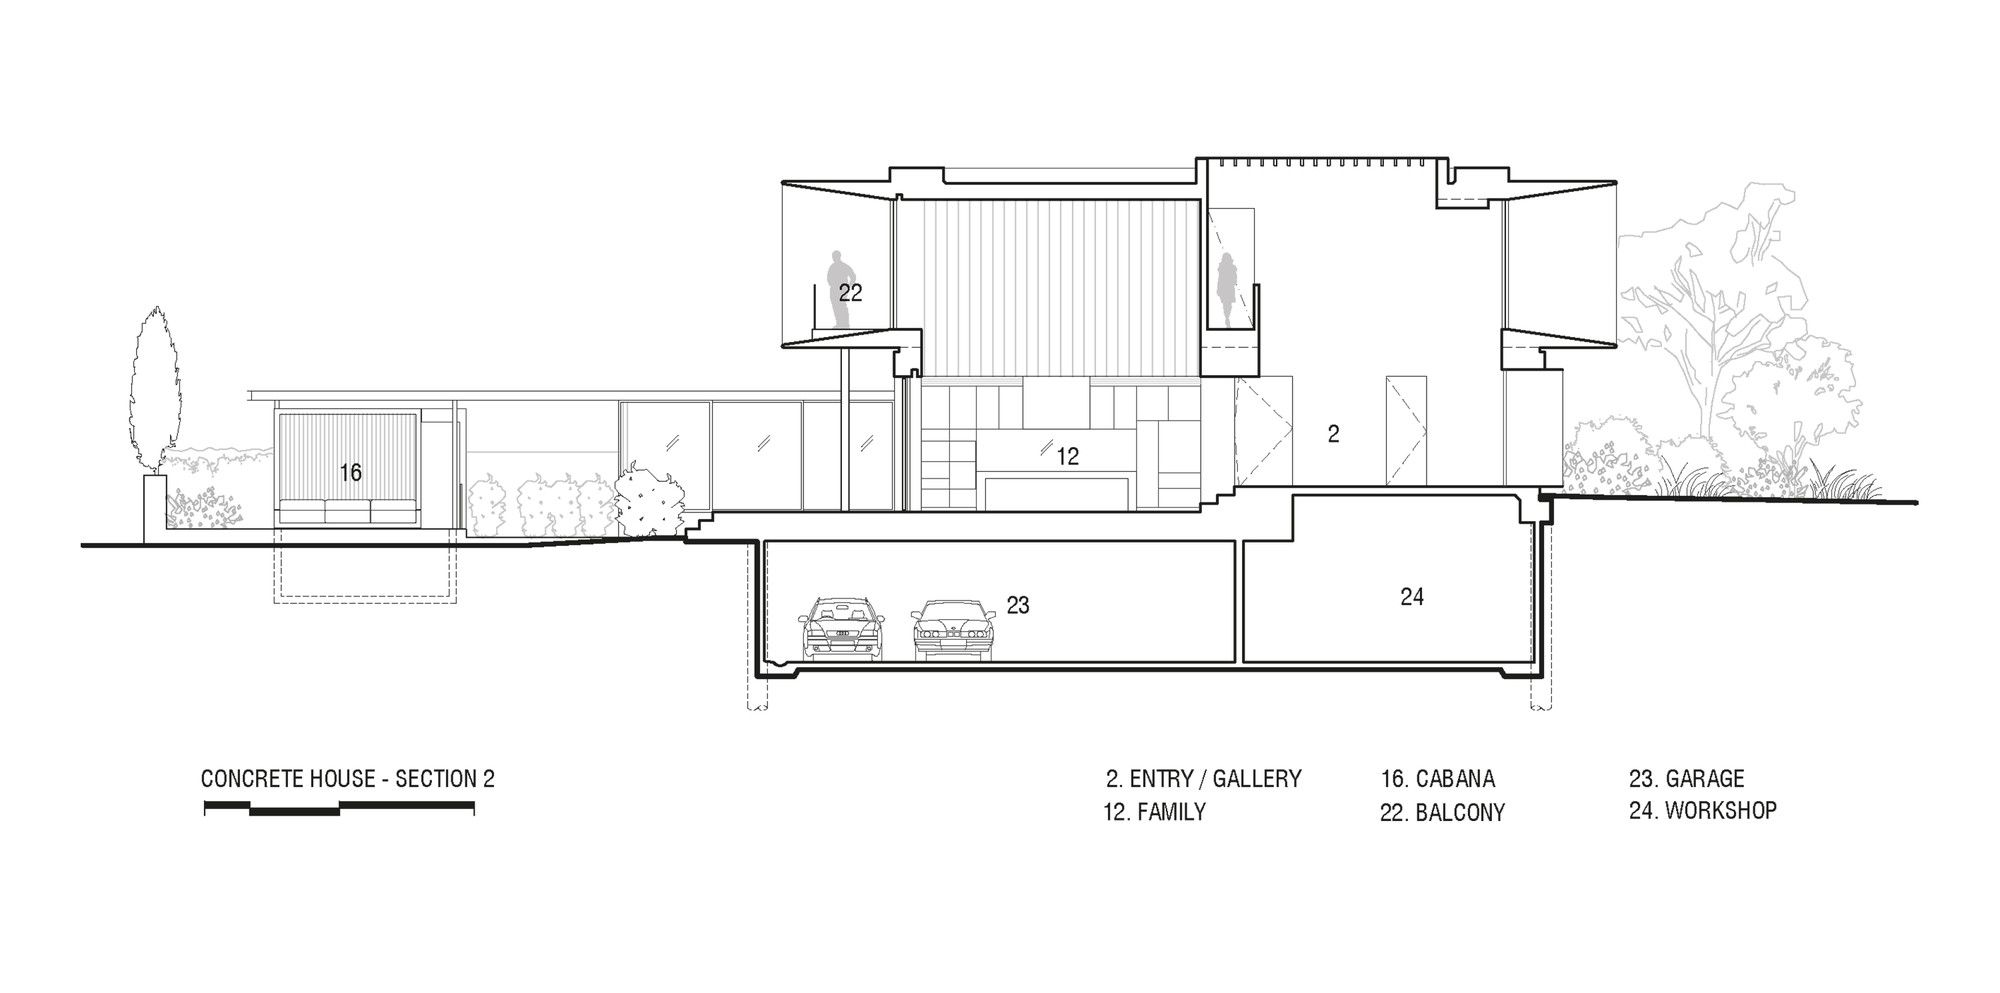 Gallery Of Concrete House Matt Gibson Architecture 25 Concrete House Architectural Section Architecture Design